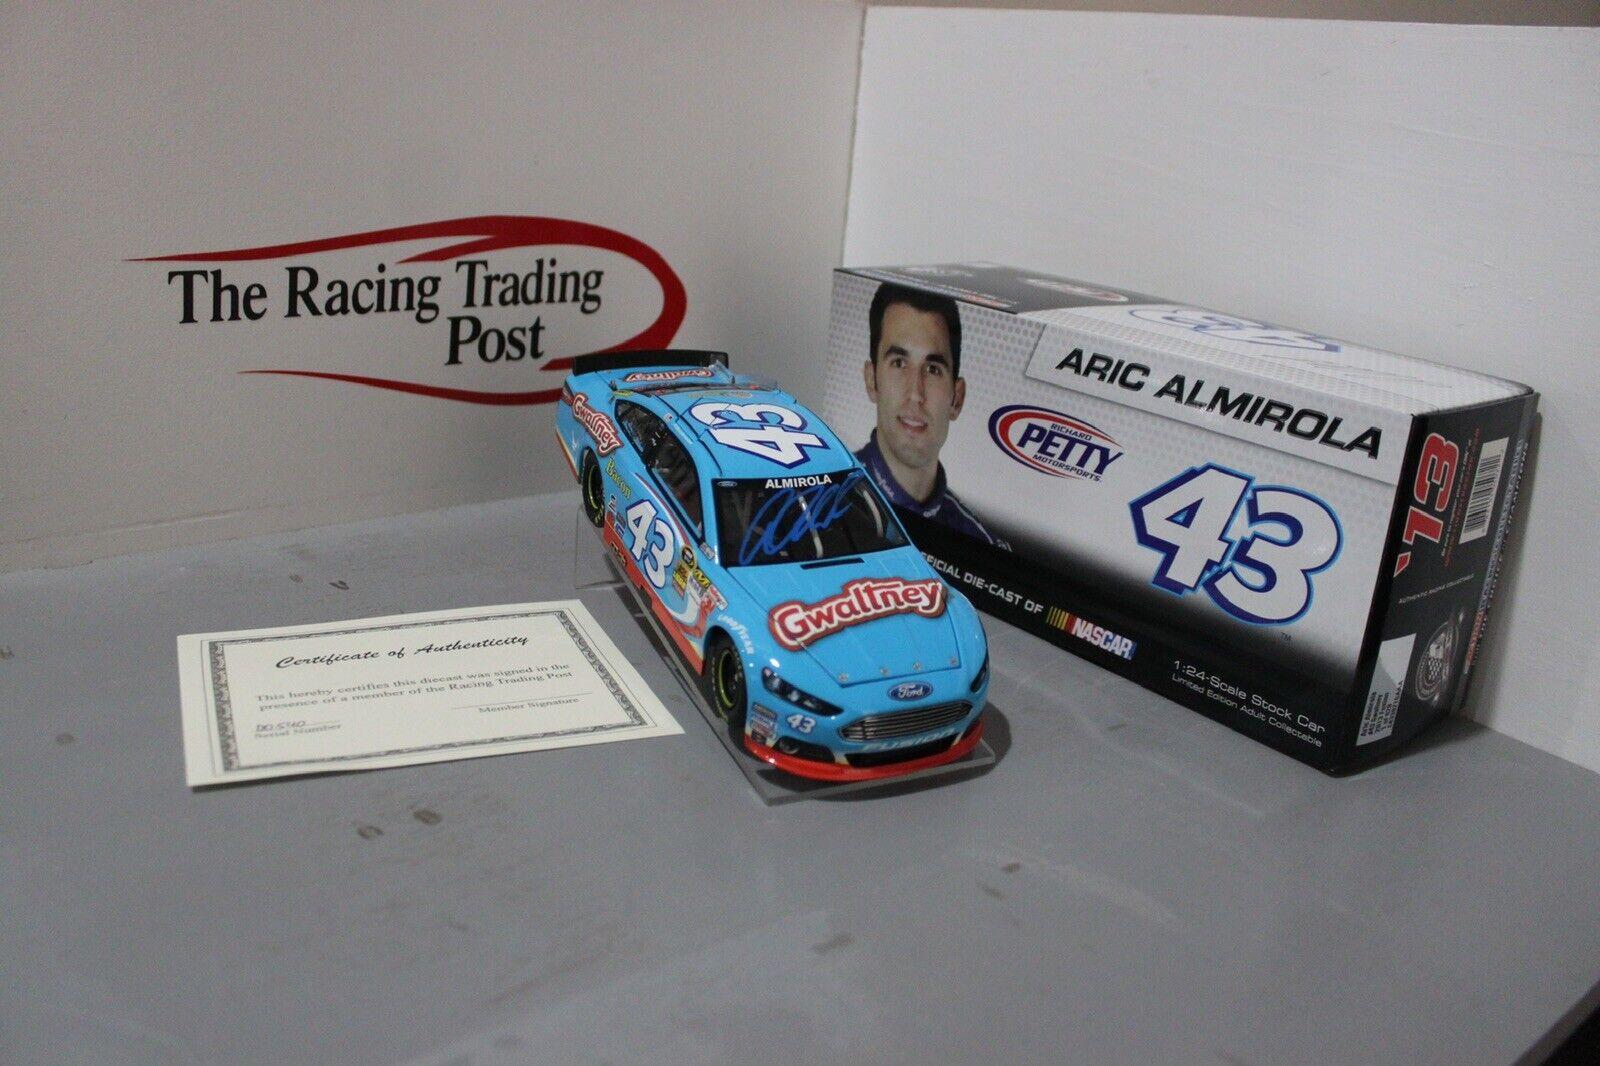 2013 Aric Almirola  Gwaltney Ford Fusion Autographed 1 24 Diecast auto - blu